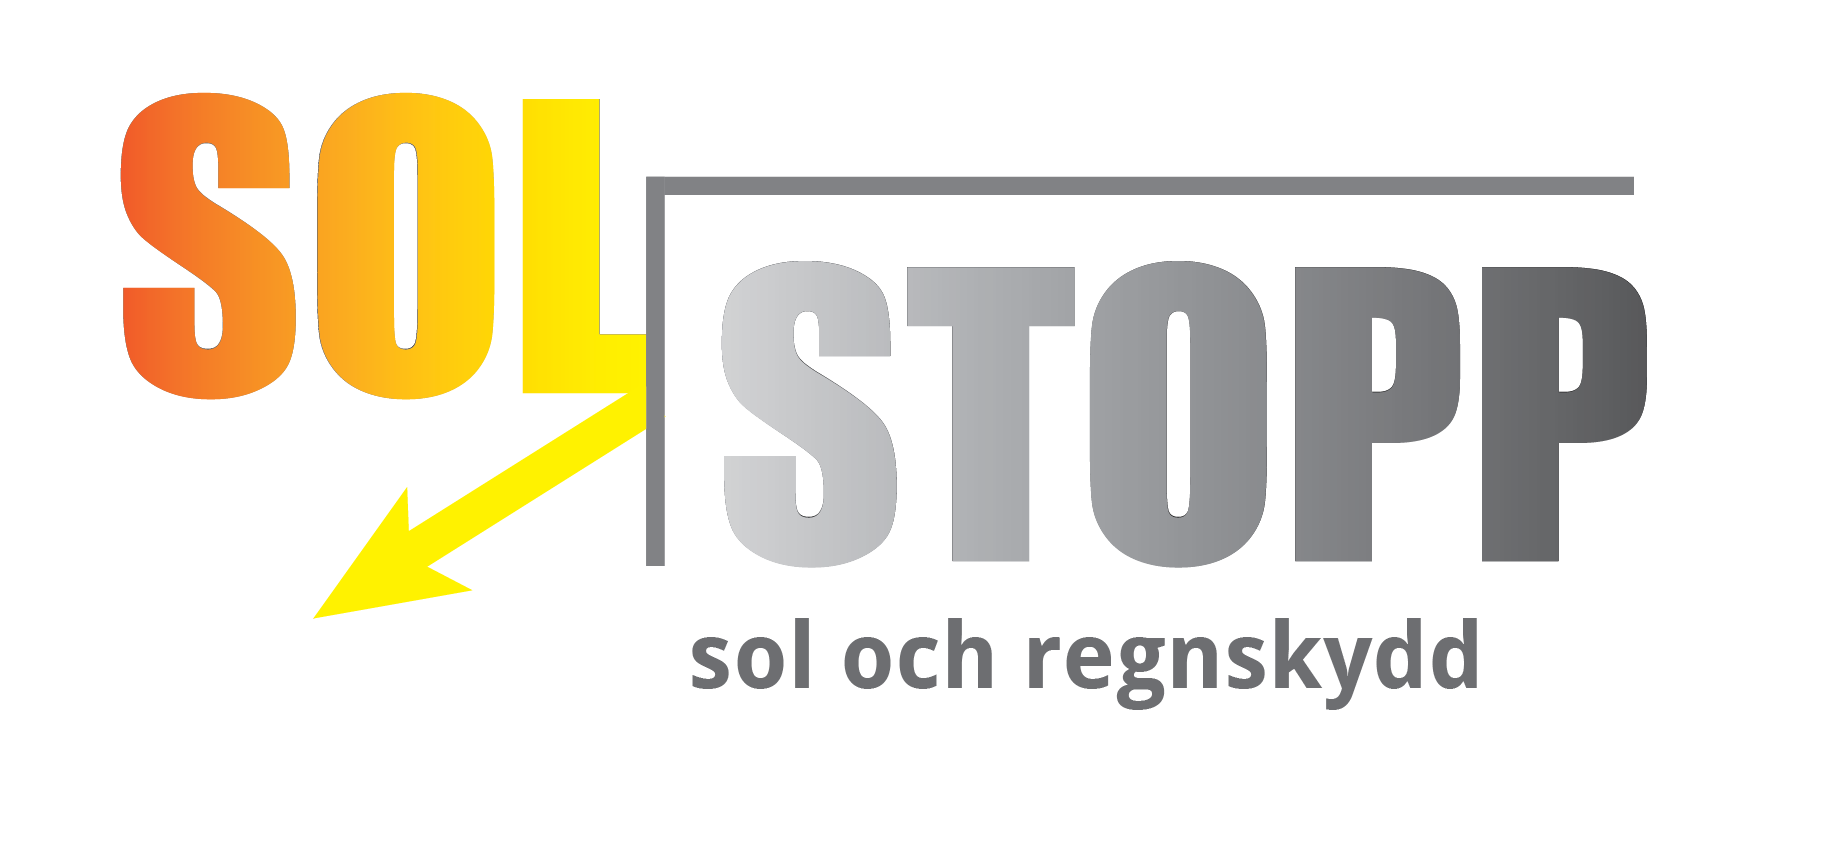 Solstopp